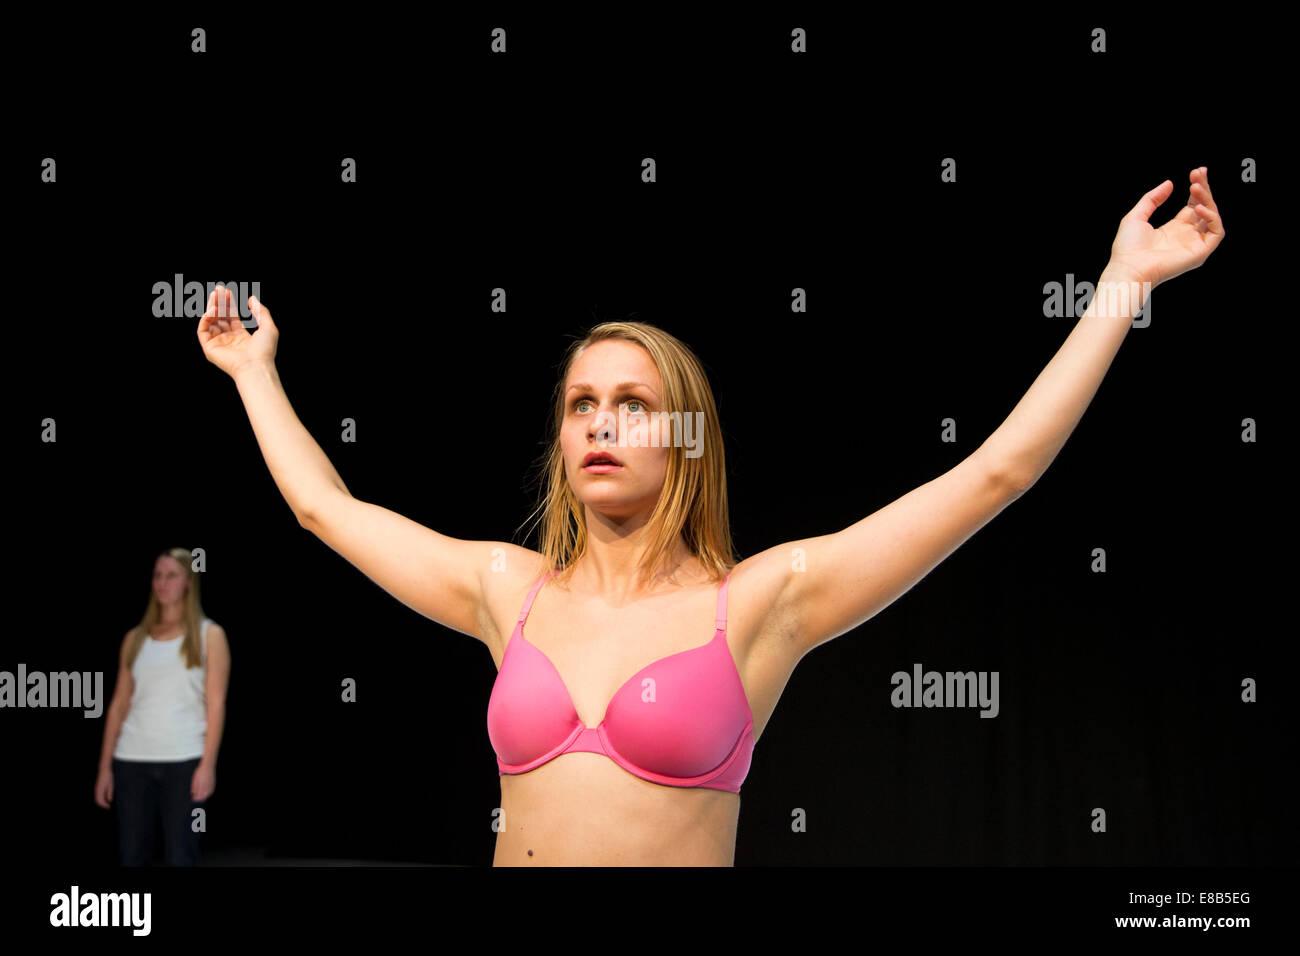 Bikini Chantal Monaghan nude (78 photos), Topless, Paparazzi, Feet, cameltoe 2017